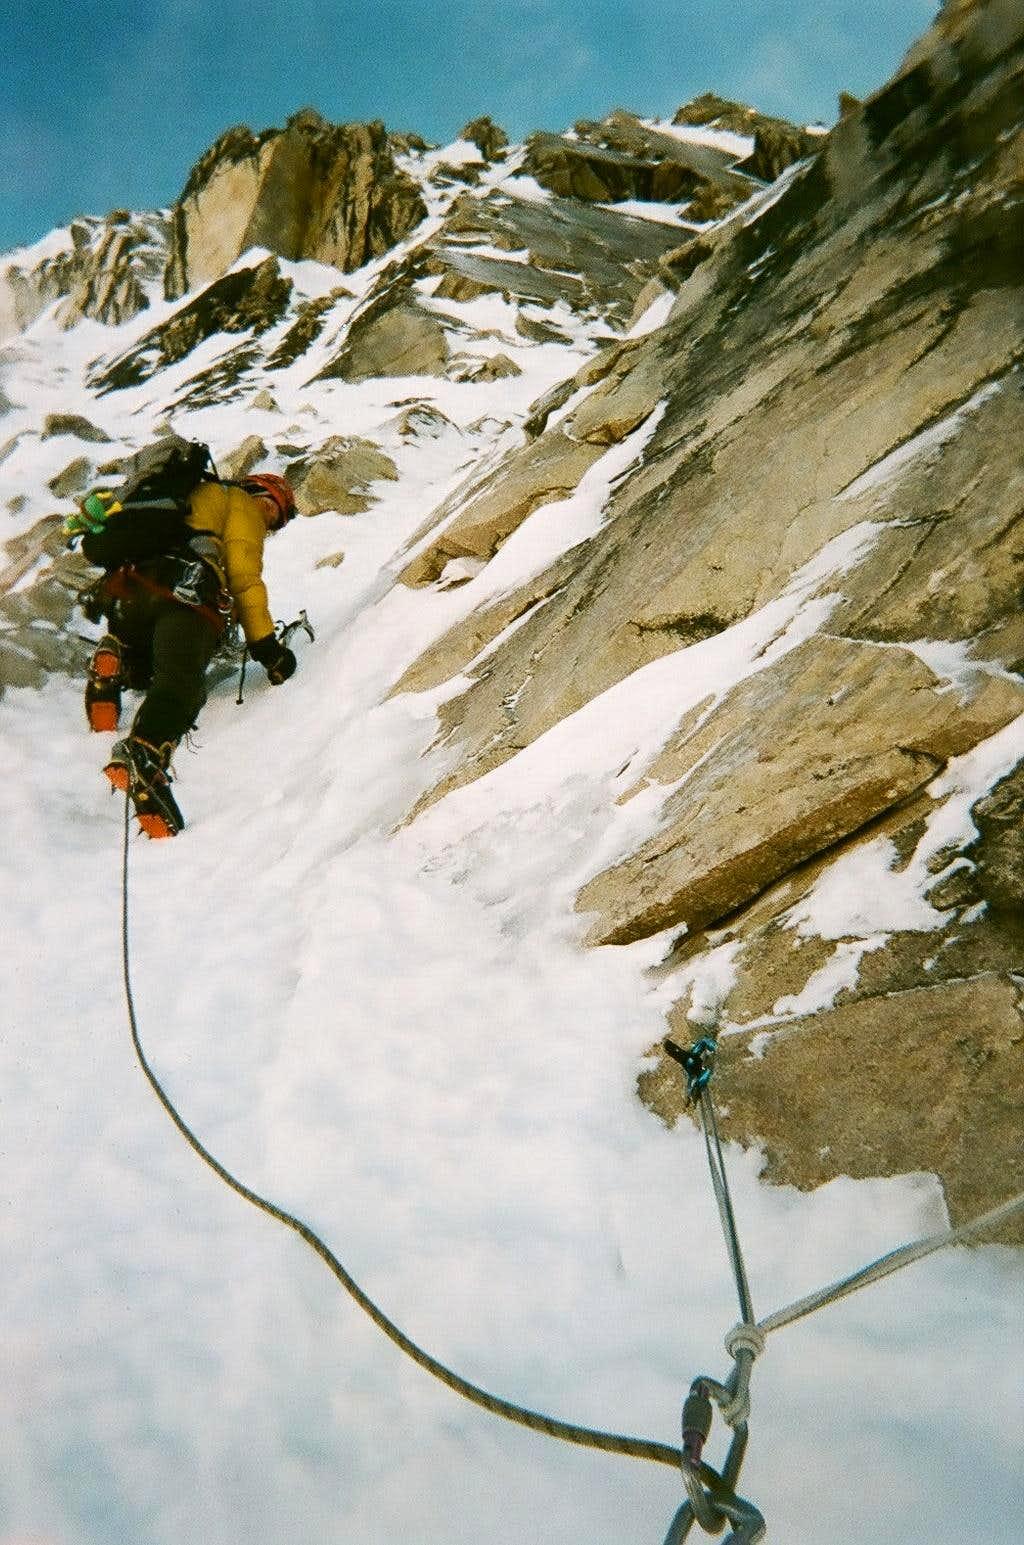 Mixed Climbing on SE Arete